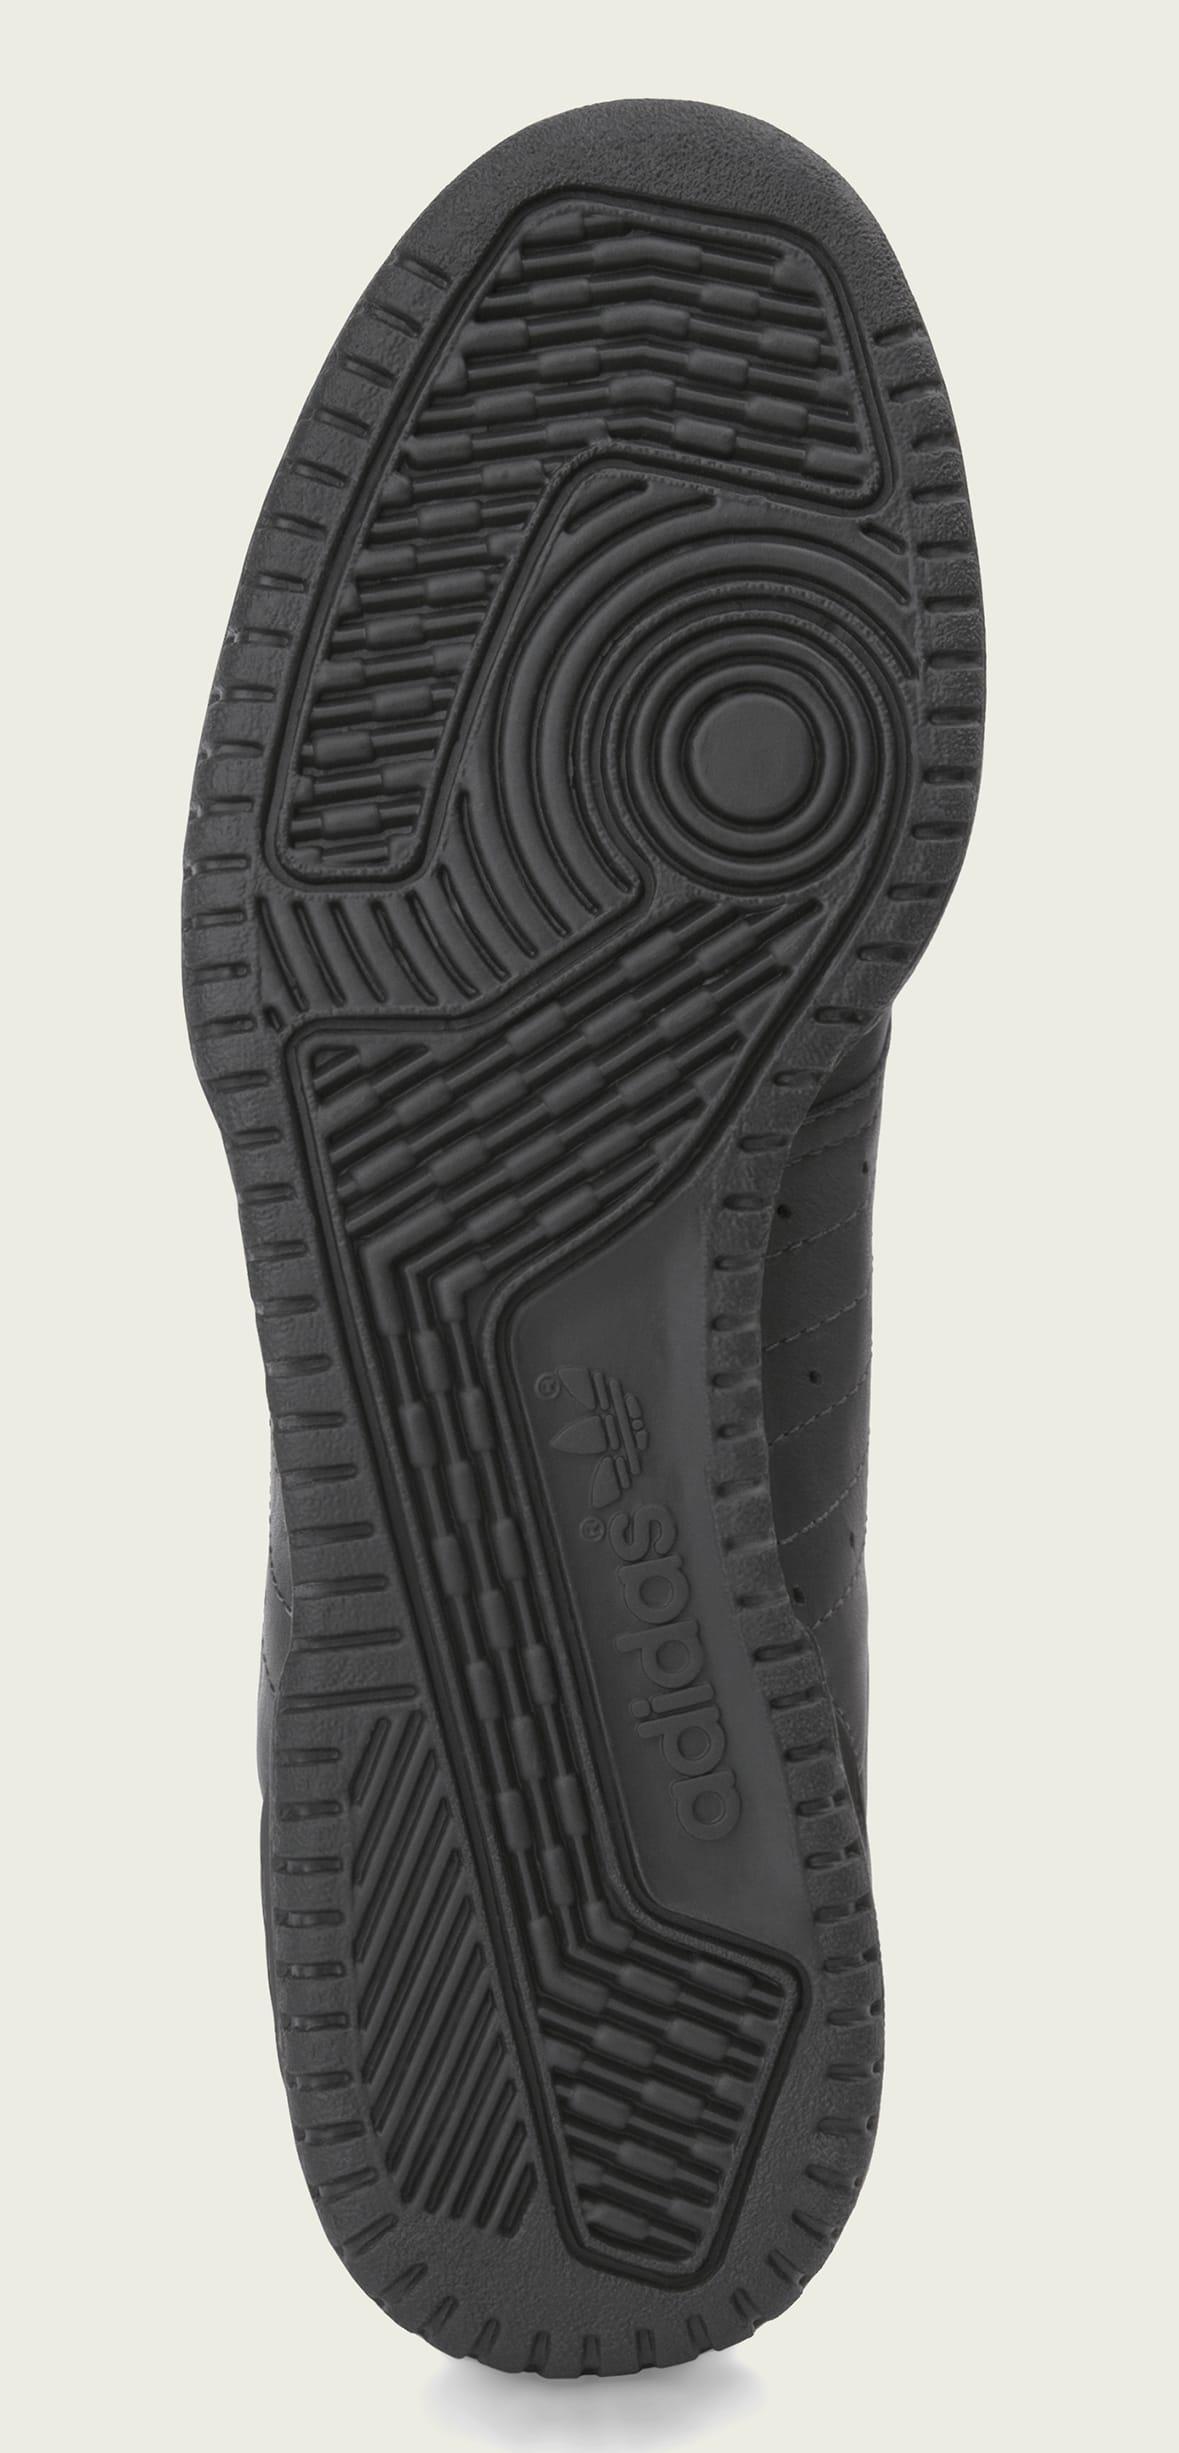 Adidas Yeezy Powerphase 'Core Black' CG6420 (Sole)